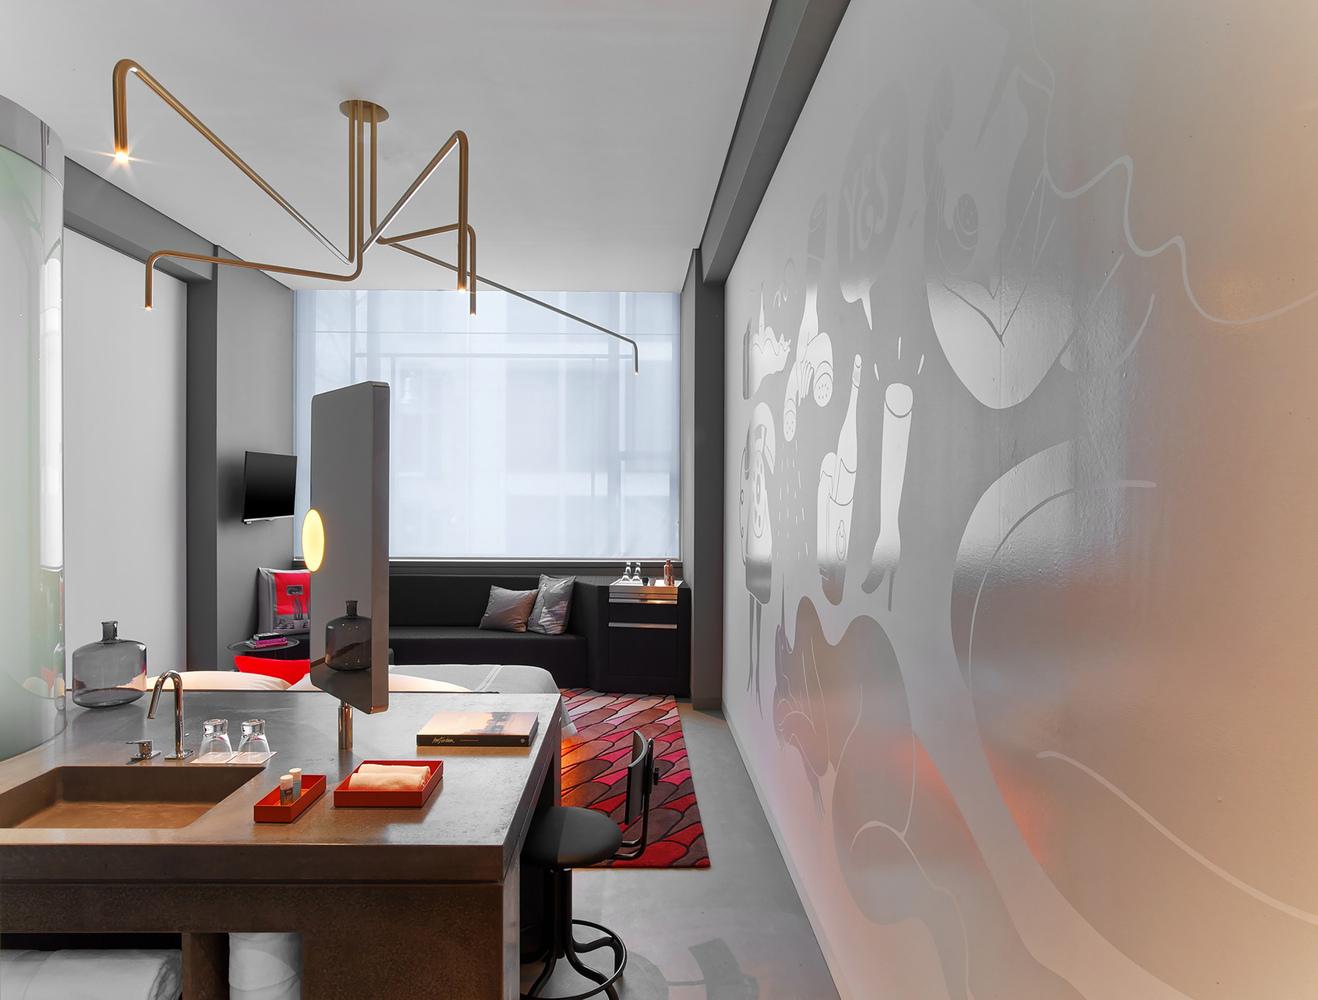 5_W Hotel Amsterdam_Office WInhov_Inspirationist